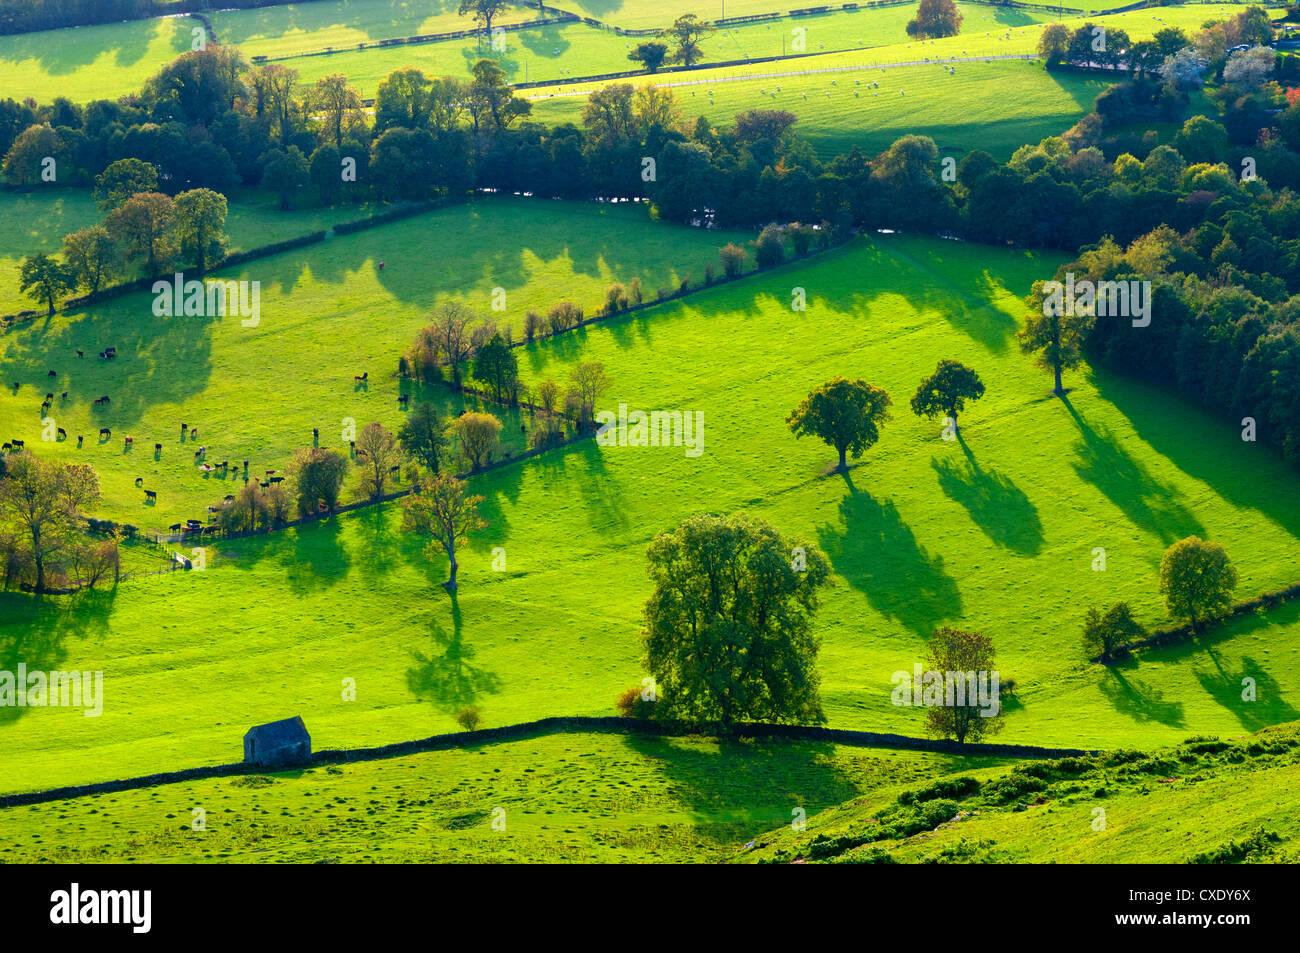 River Manifold Valley near Ilam, Peak District National Park, Derbyshire, England Stock Photo